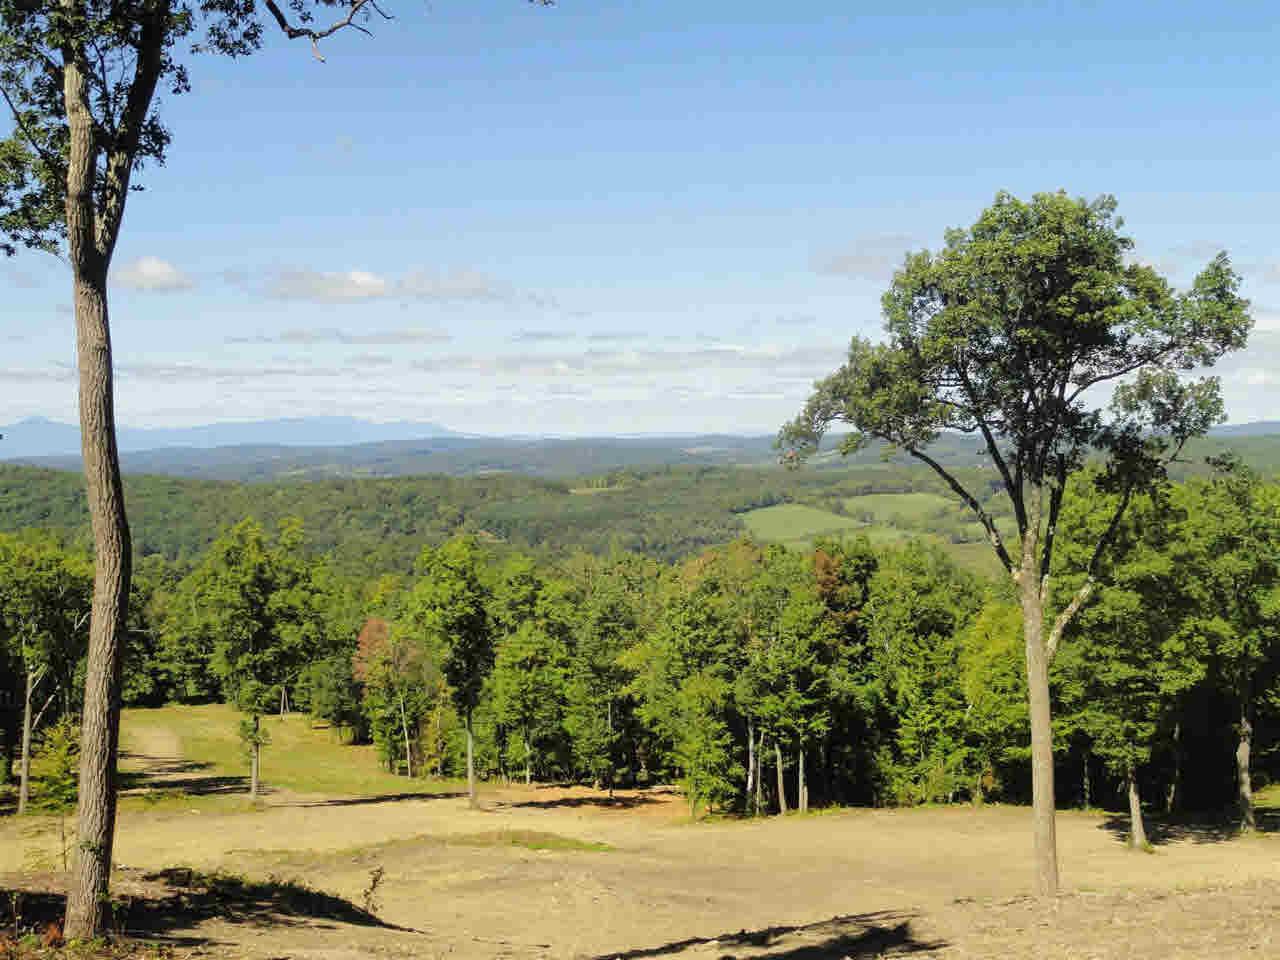 Land for Sale at SKUNKS MISERY ROAD Pine Plains, New York 12546 United States